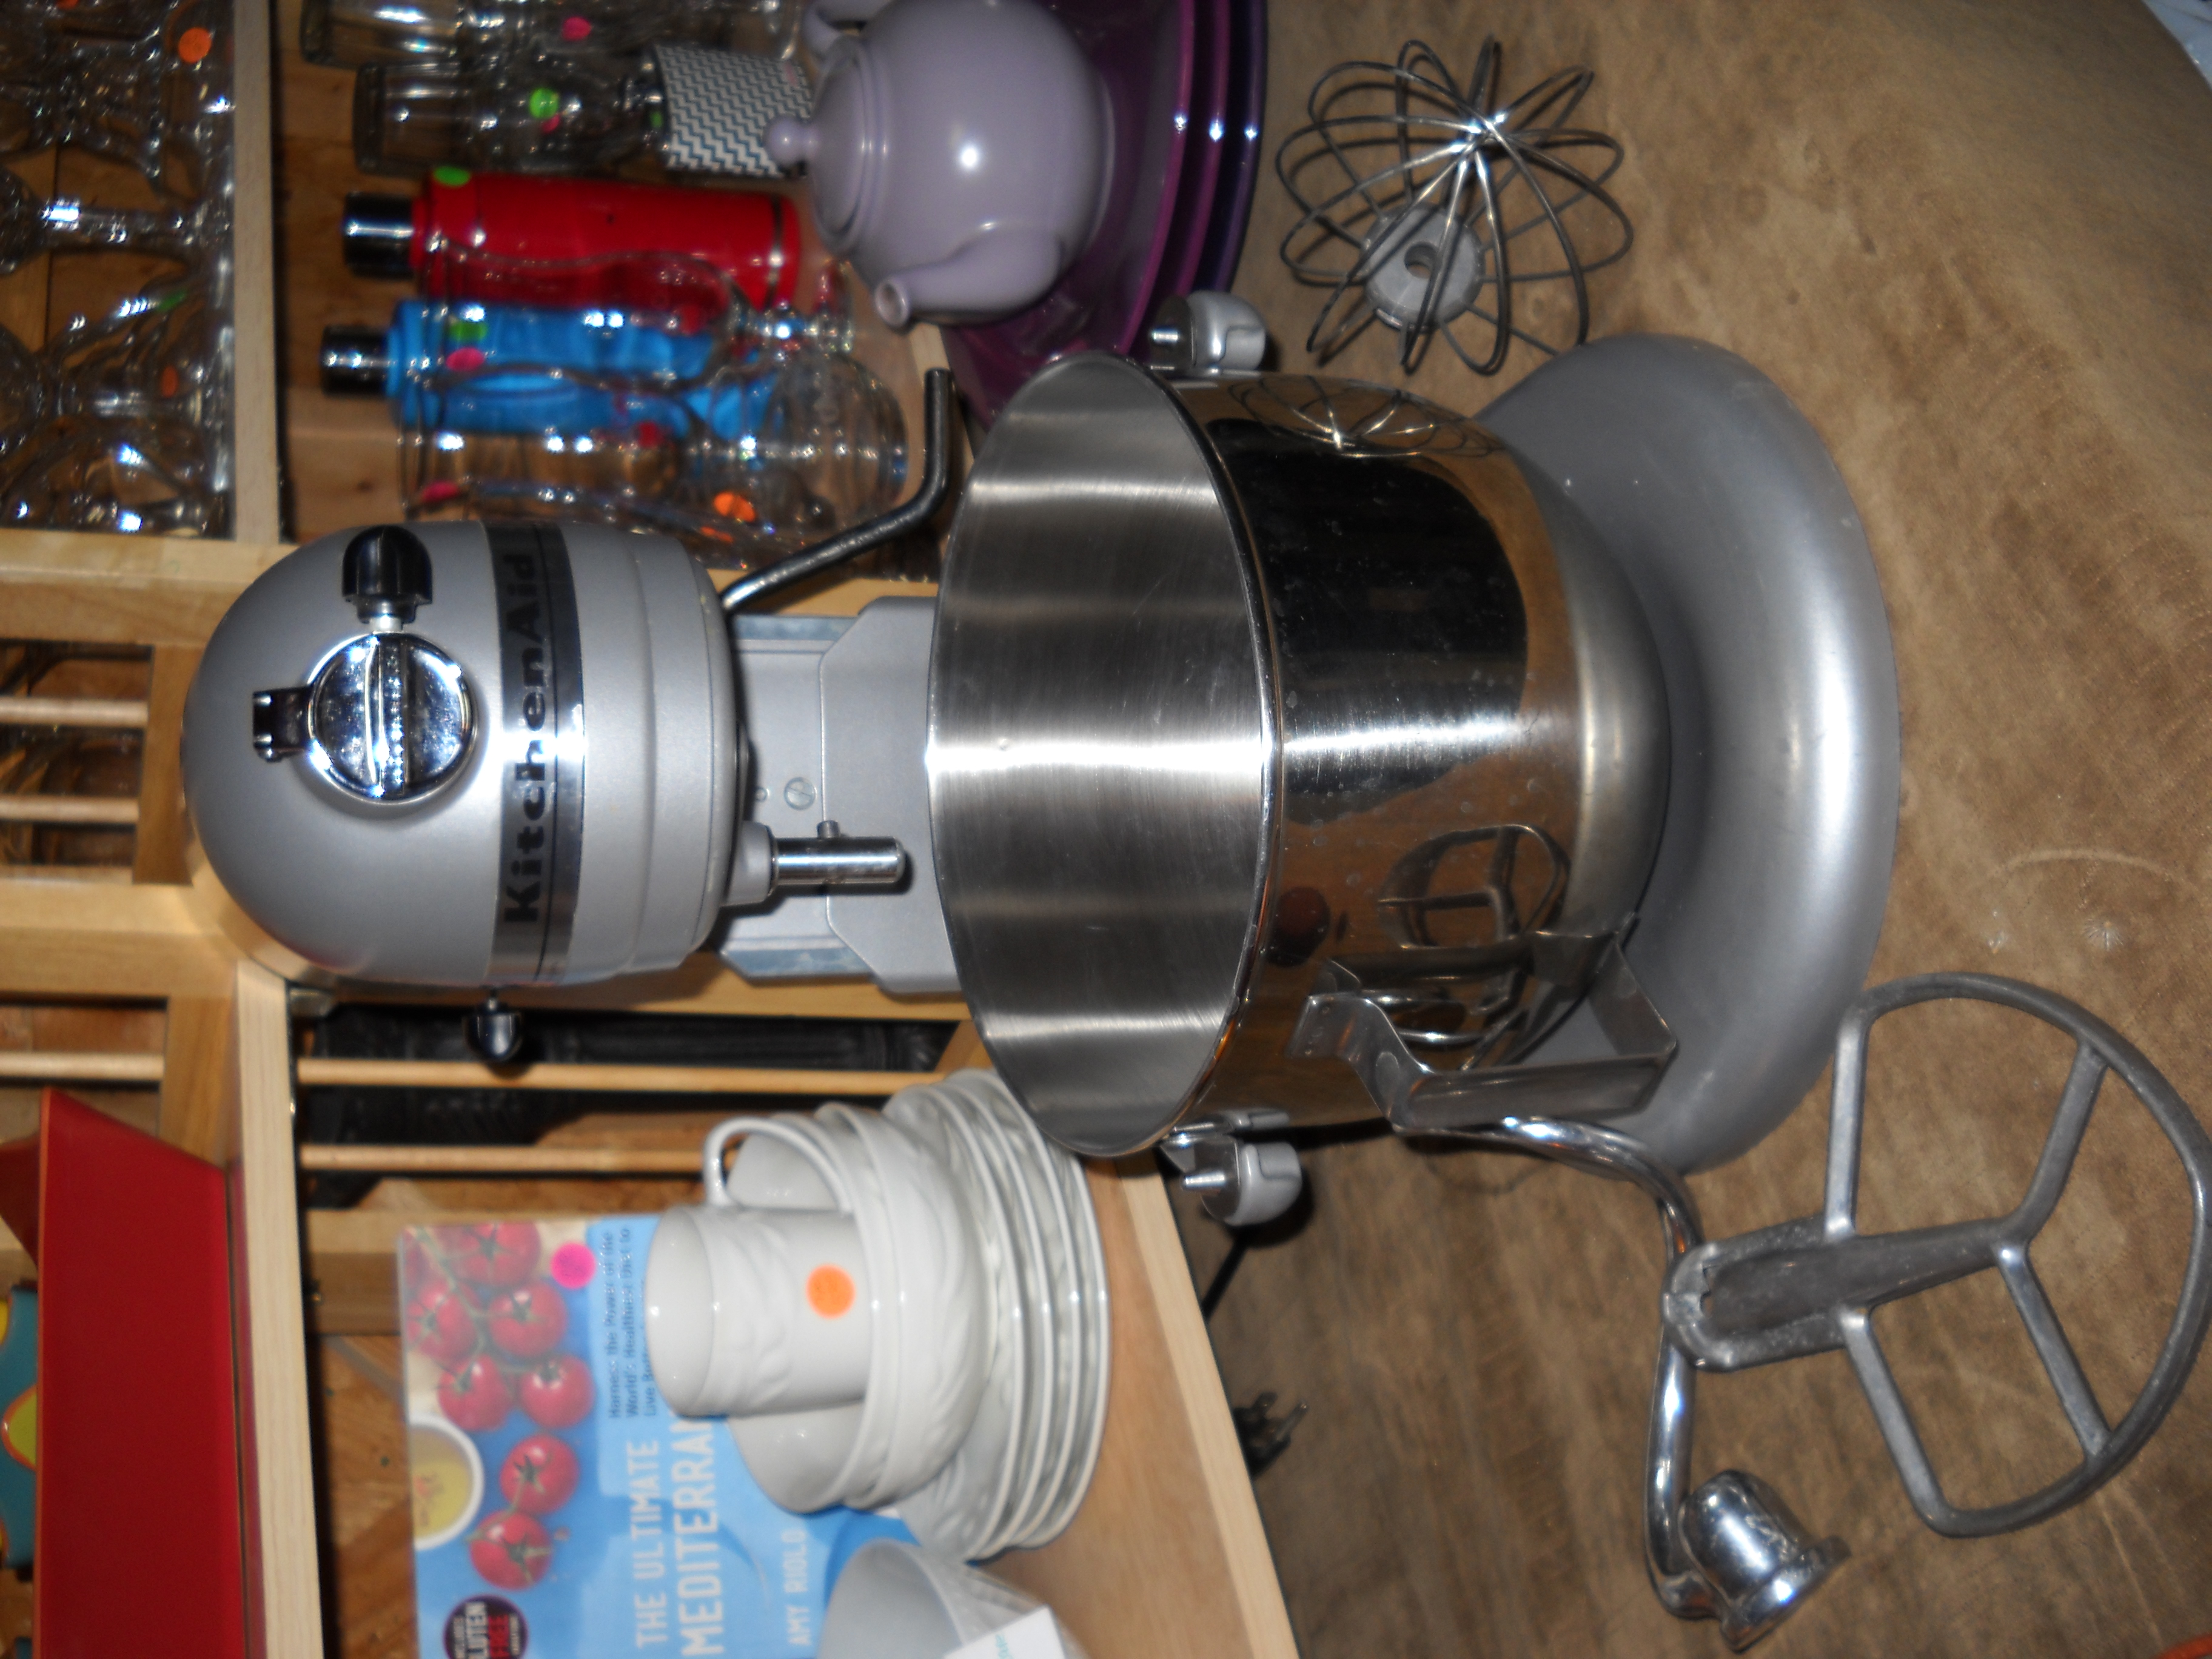 Kitchenaid mixer2